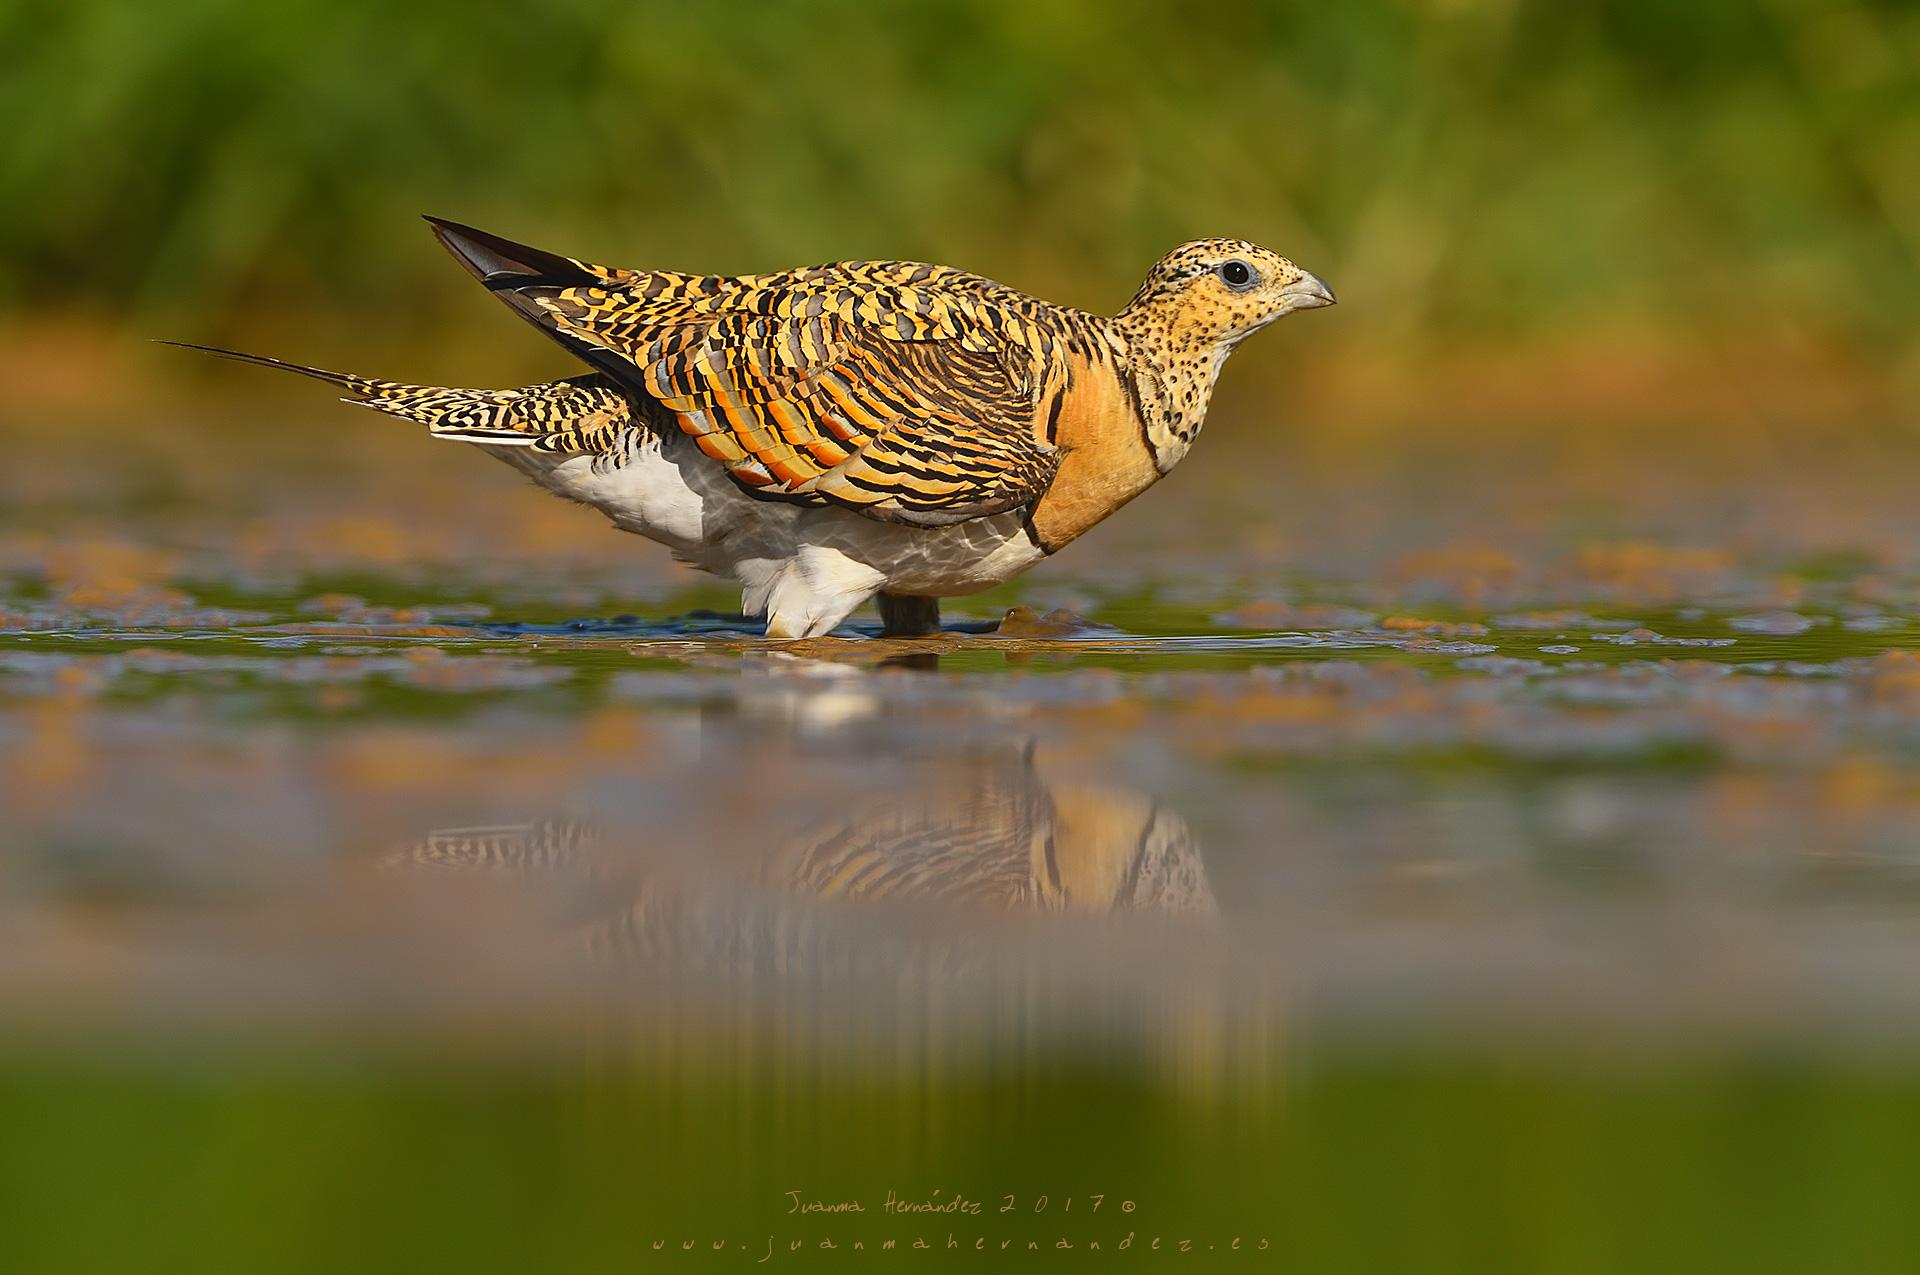 Pterocliformes - Juanma Hernández, Fotografía de Naturaleza